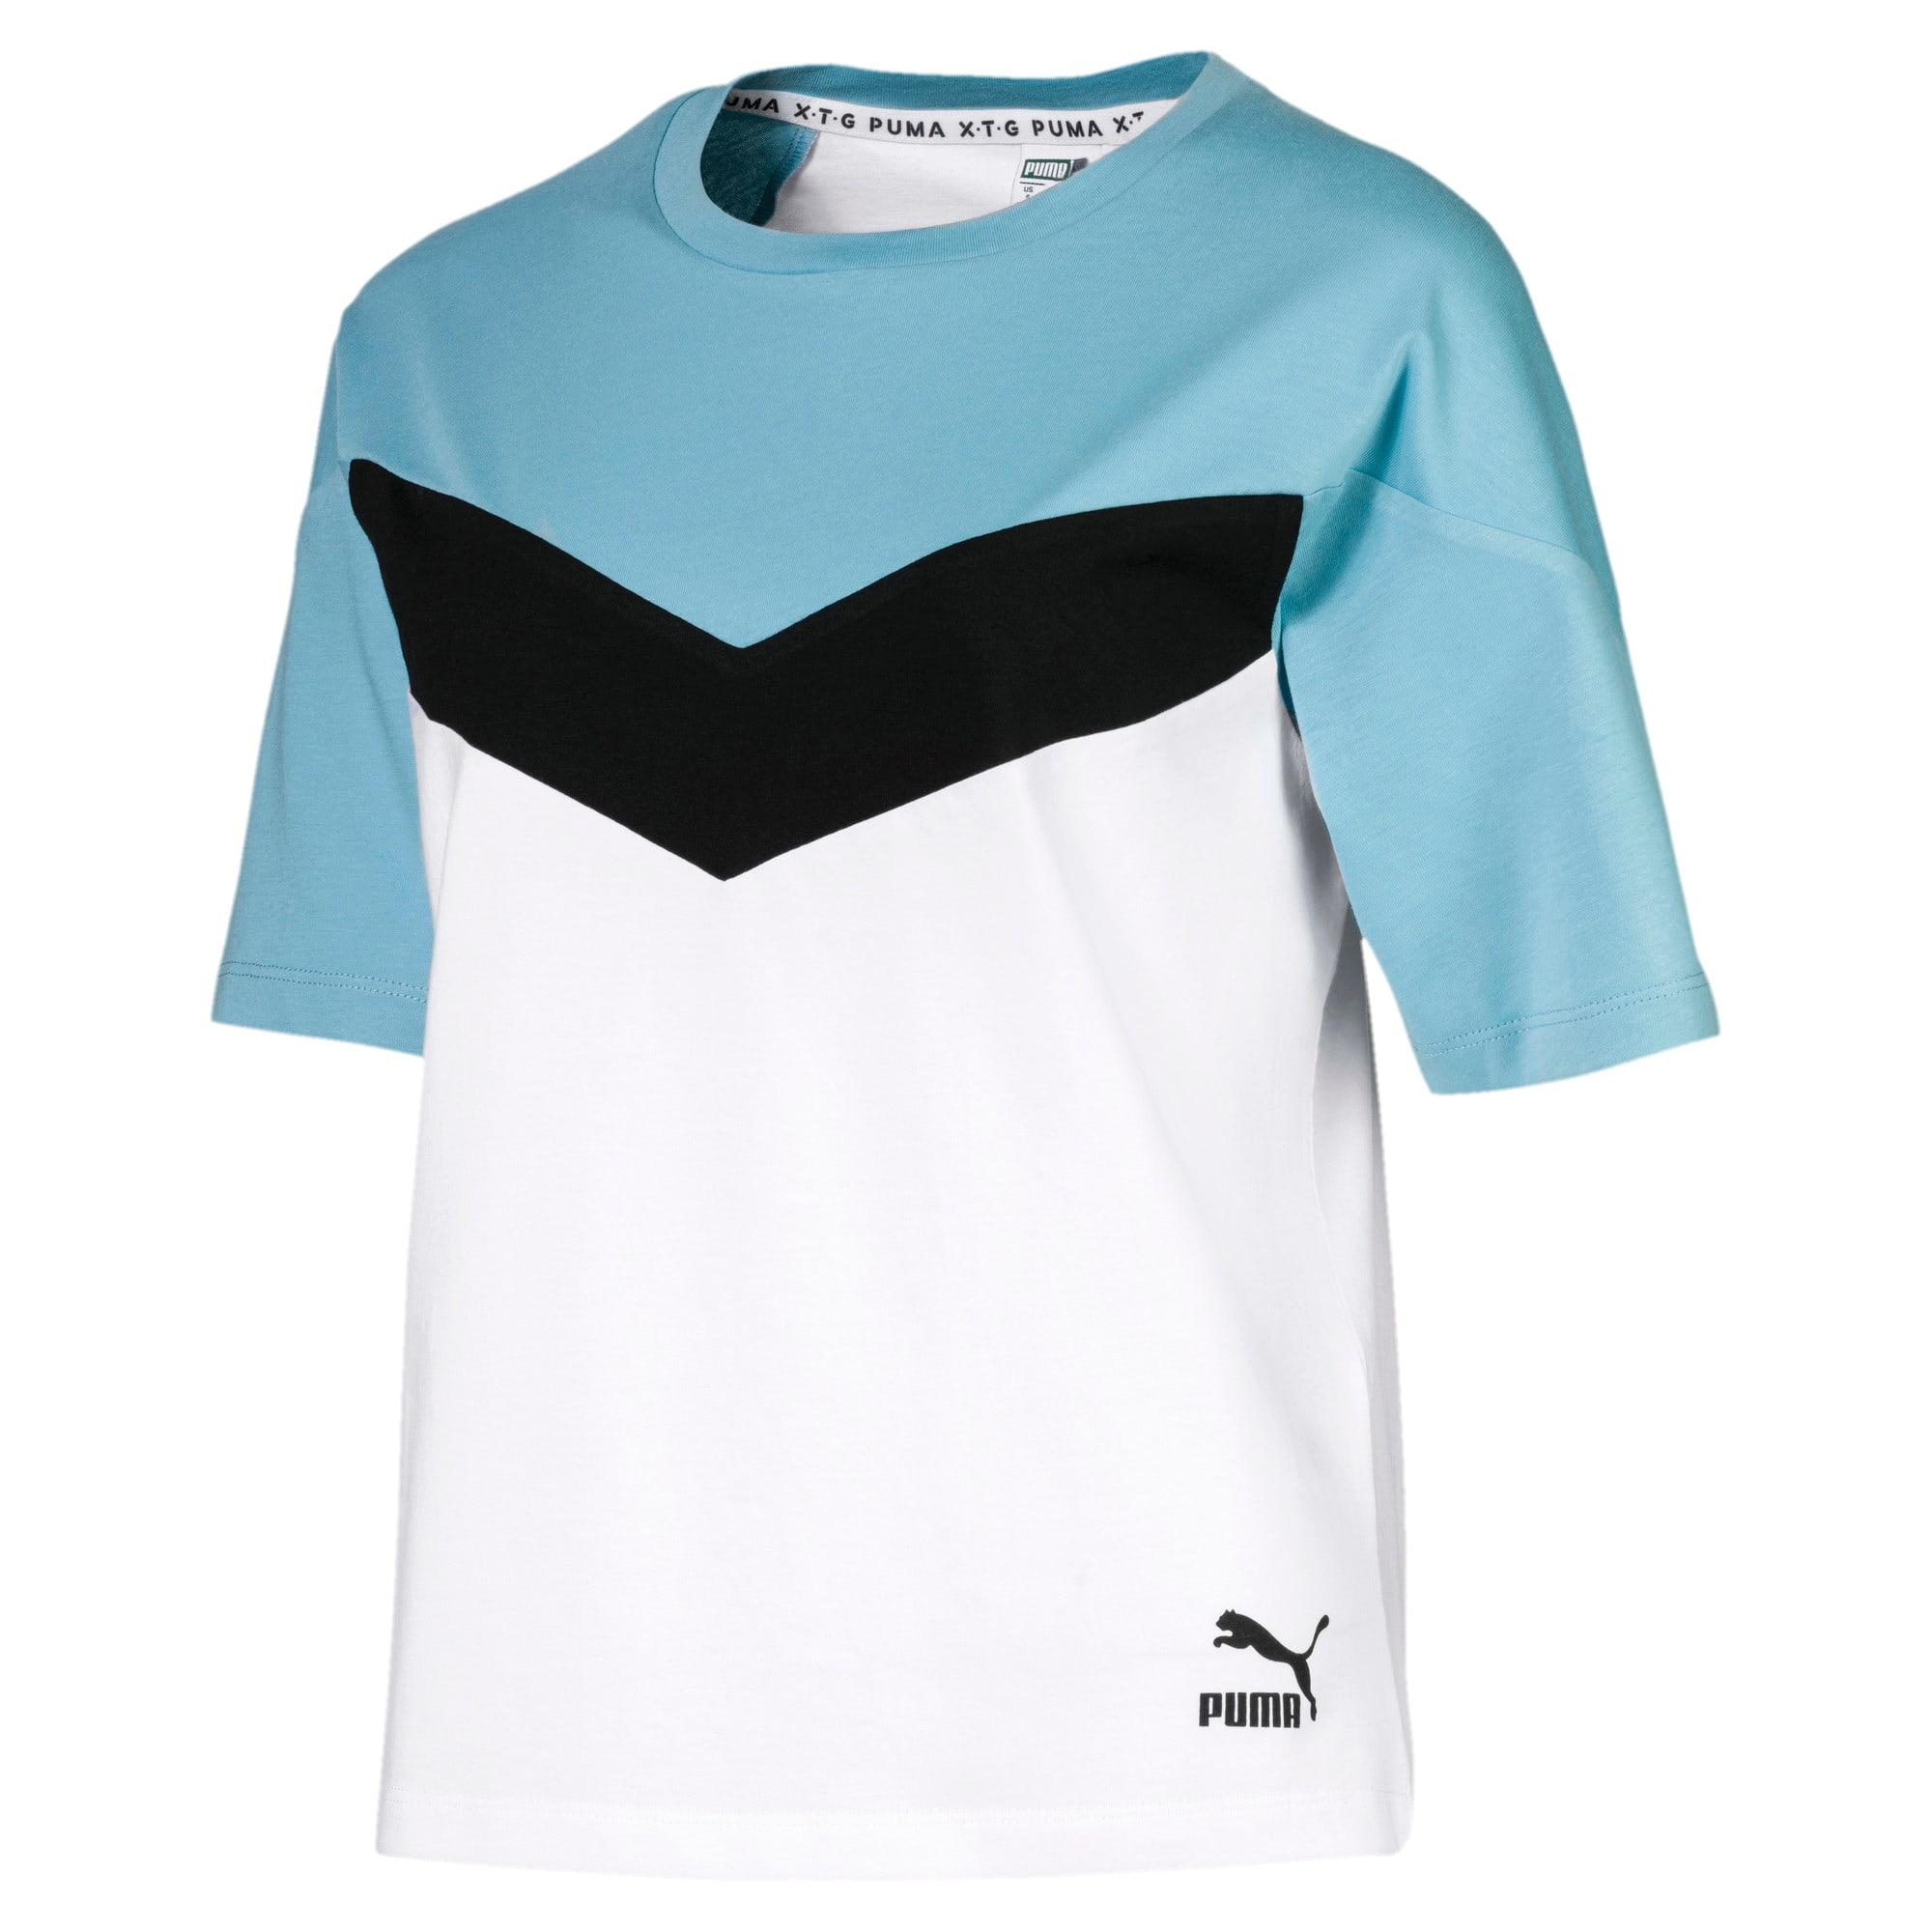 Miniatura 4 de Camiseta PUMA XTG en colores combinados para mujer, Puma White, mediano